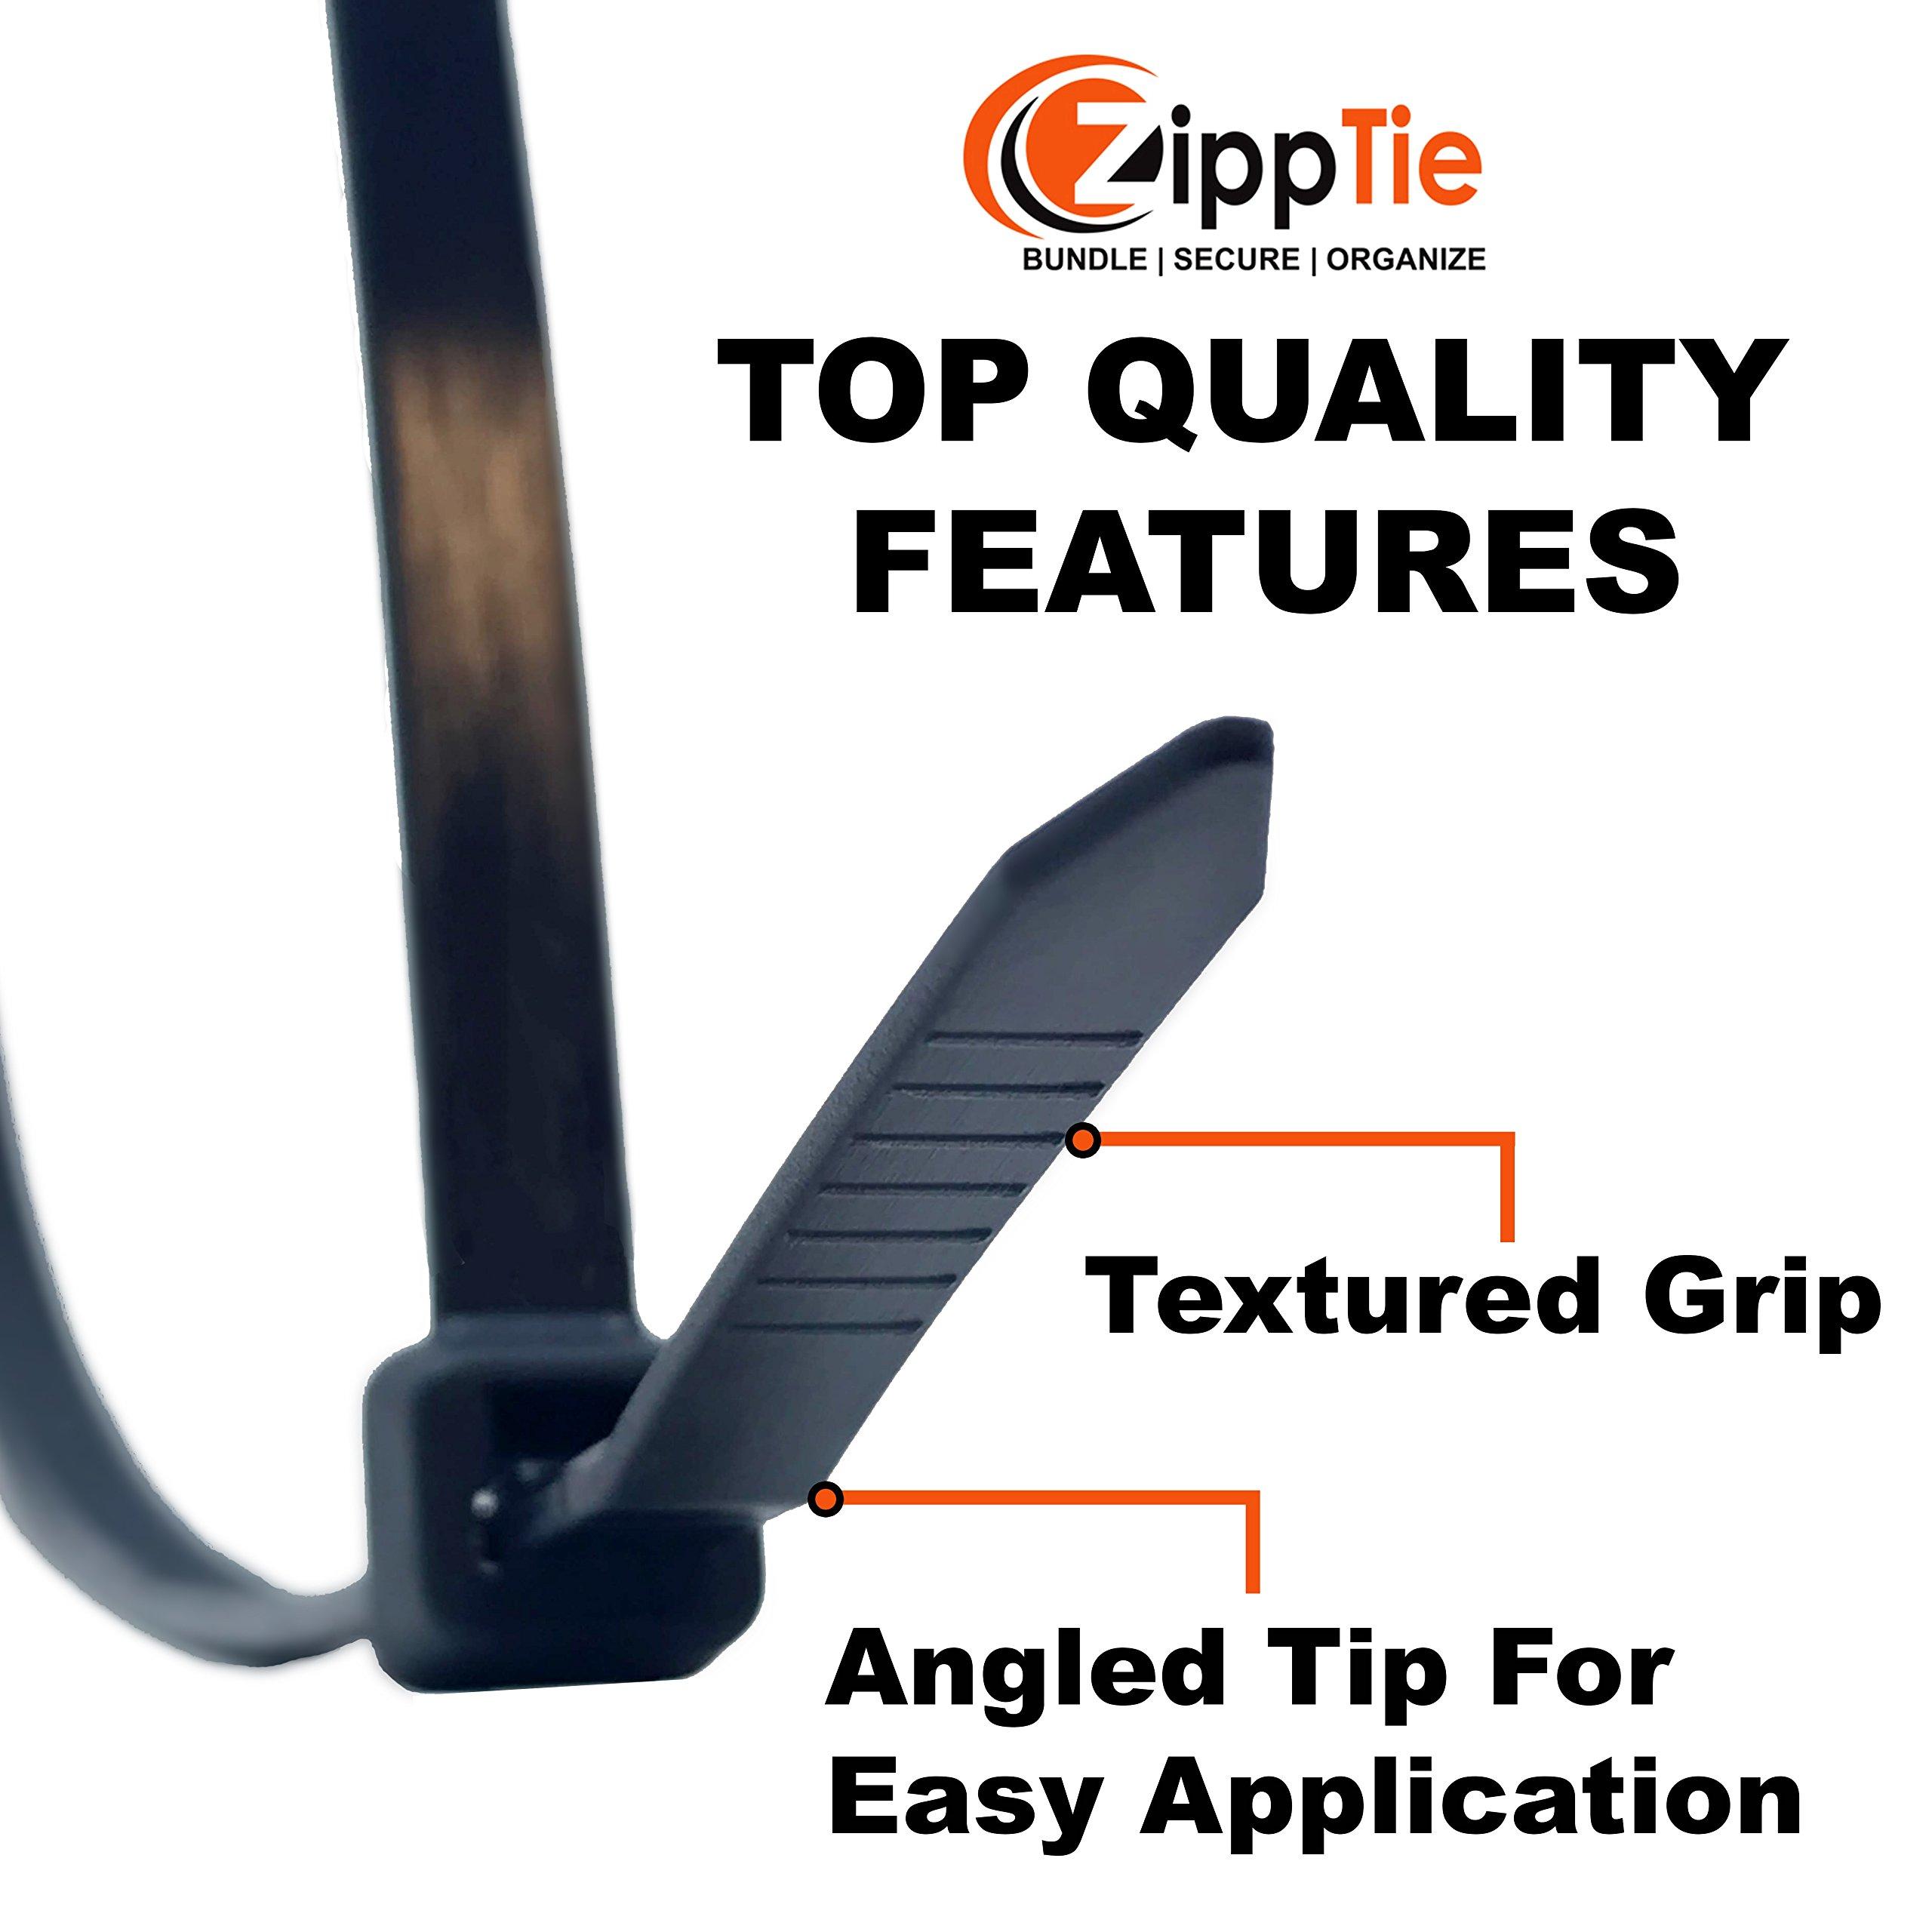 Cable Ties by ZippTie | 225pc Cable Management Kit 6'', 8'', 12'' White & UV Black Heavy Duty (Zip Ties) 50lb & 75lb | Includes 20 Adhesive Base Mounts and 5 Reusable ZippCro Wraps by ZippTie Bundle | Secure | Organize (Image #3)